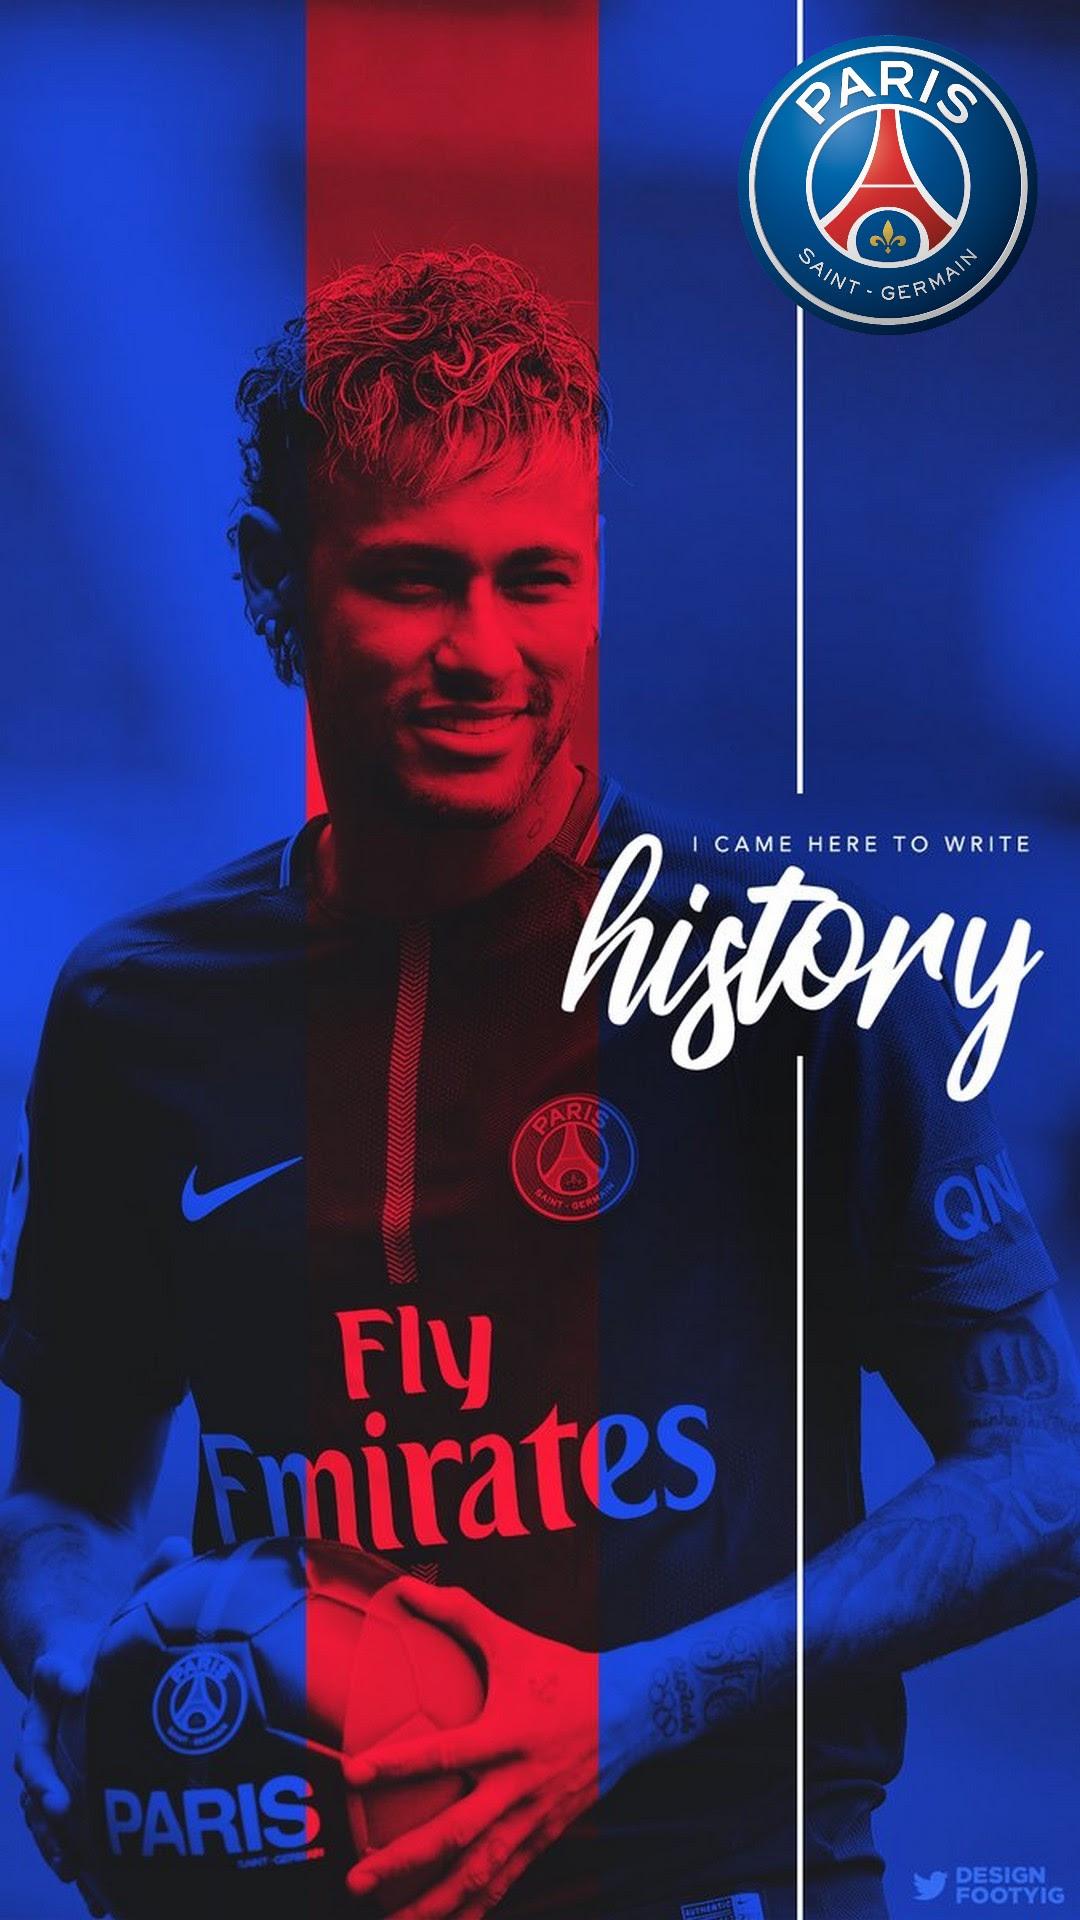 Neymar PSG HD Wallpaper For iPhone   2019 Football Wallpaper